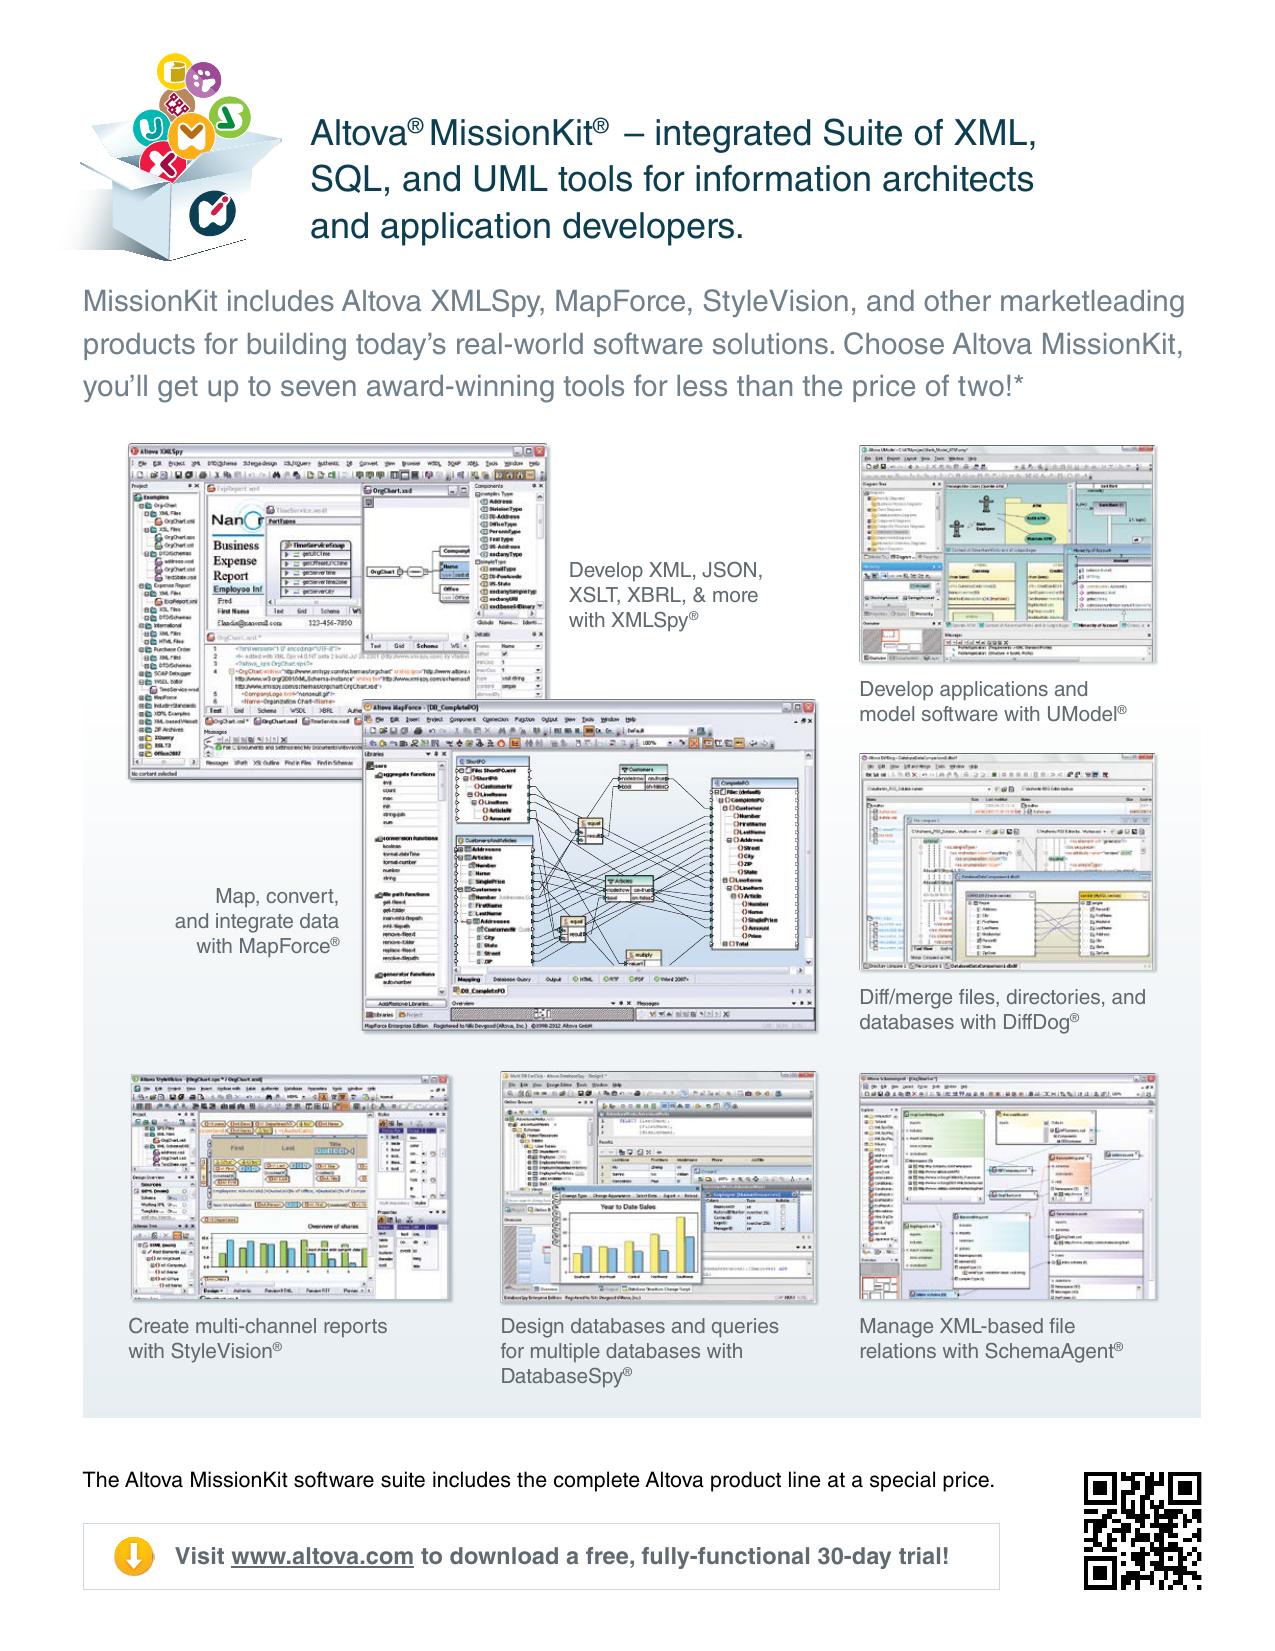 Altova® MissionKit® – integrated Suite of XML, SQL, and UML